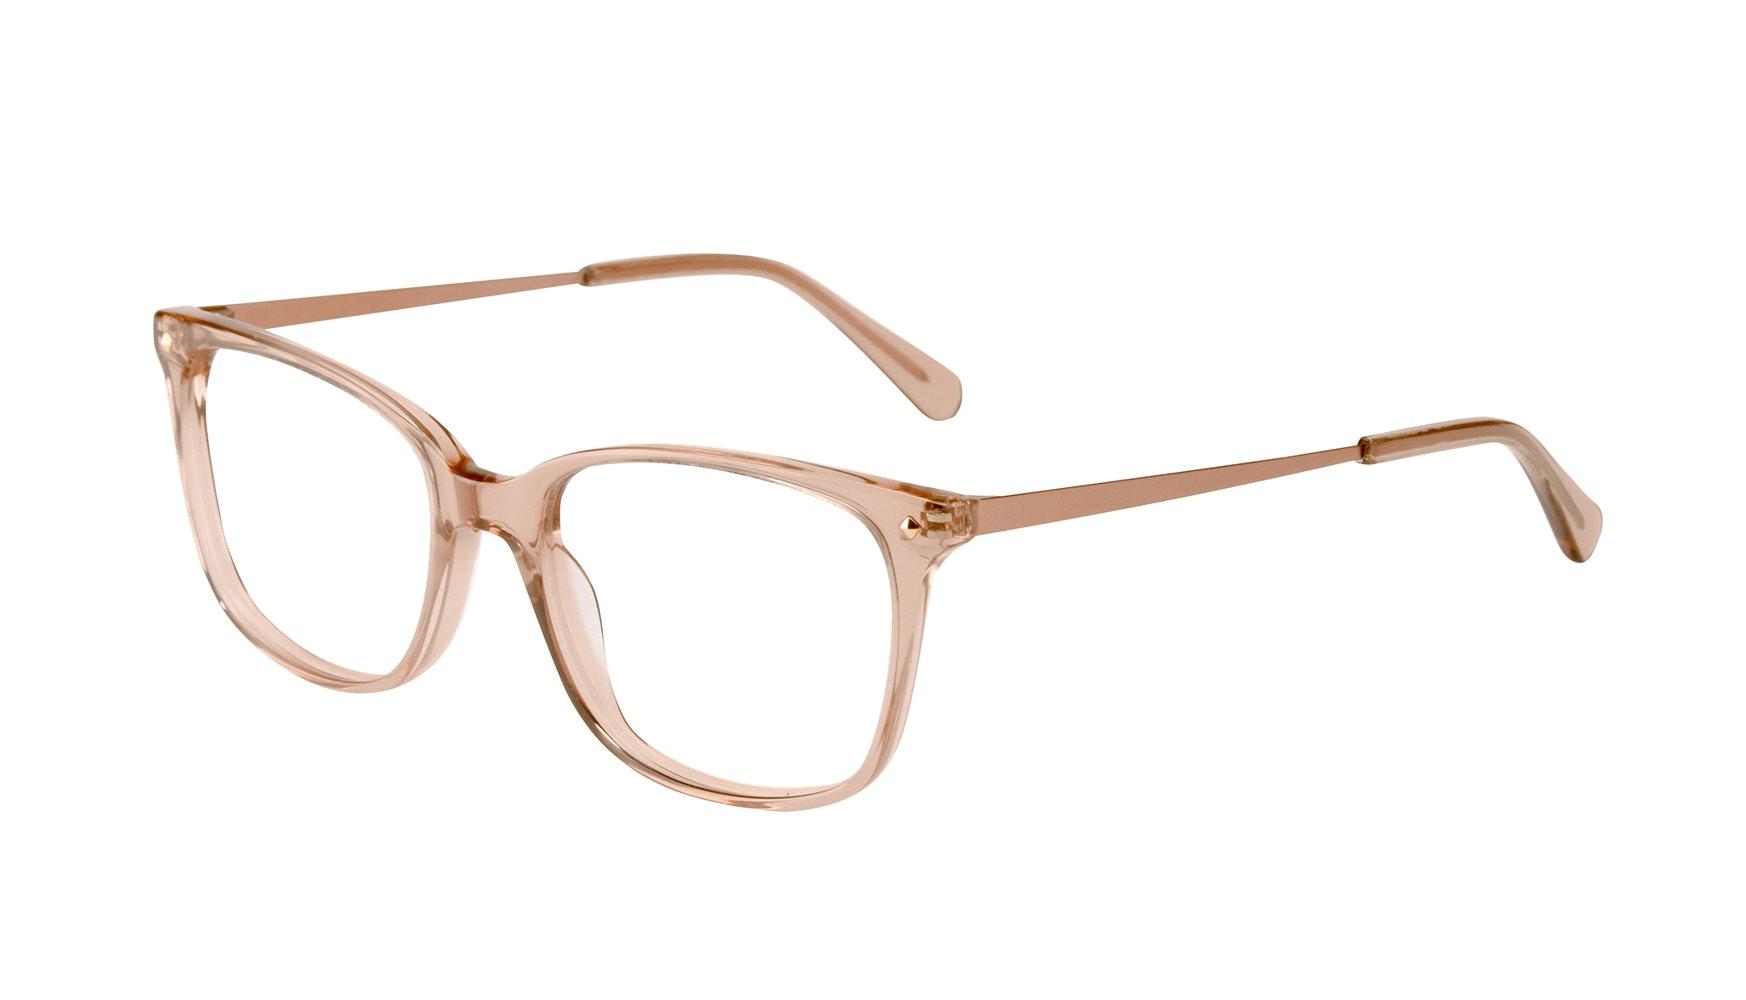 Affordable Fashion Glasses Rectangle Square Eyeglasses Women Refine Toffee Tilt